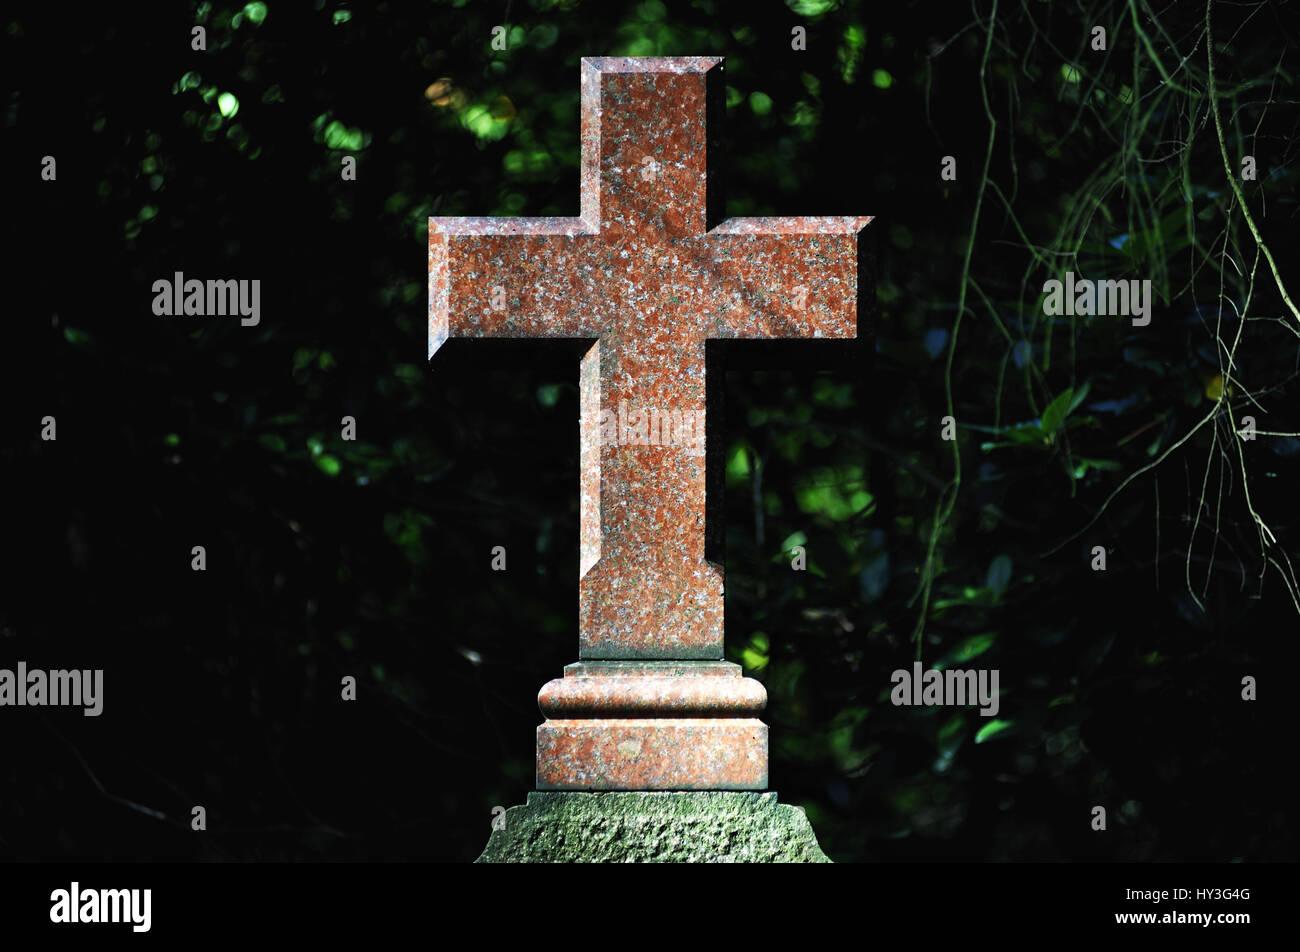 Grave cross on the Ohlsdorfer cemetery in Hamburg, Germany, Europe, Grabkreuz auf dem Ohlsdorfer Friedhof in Hamburg, Deutschland, Europa Stock Photo